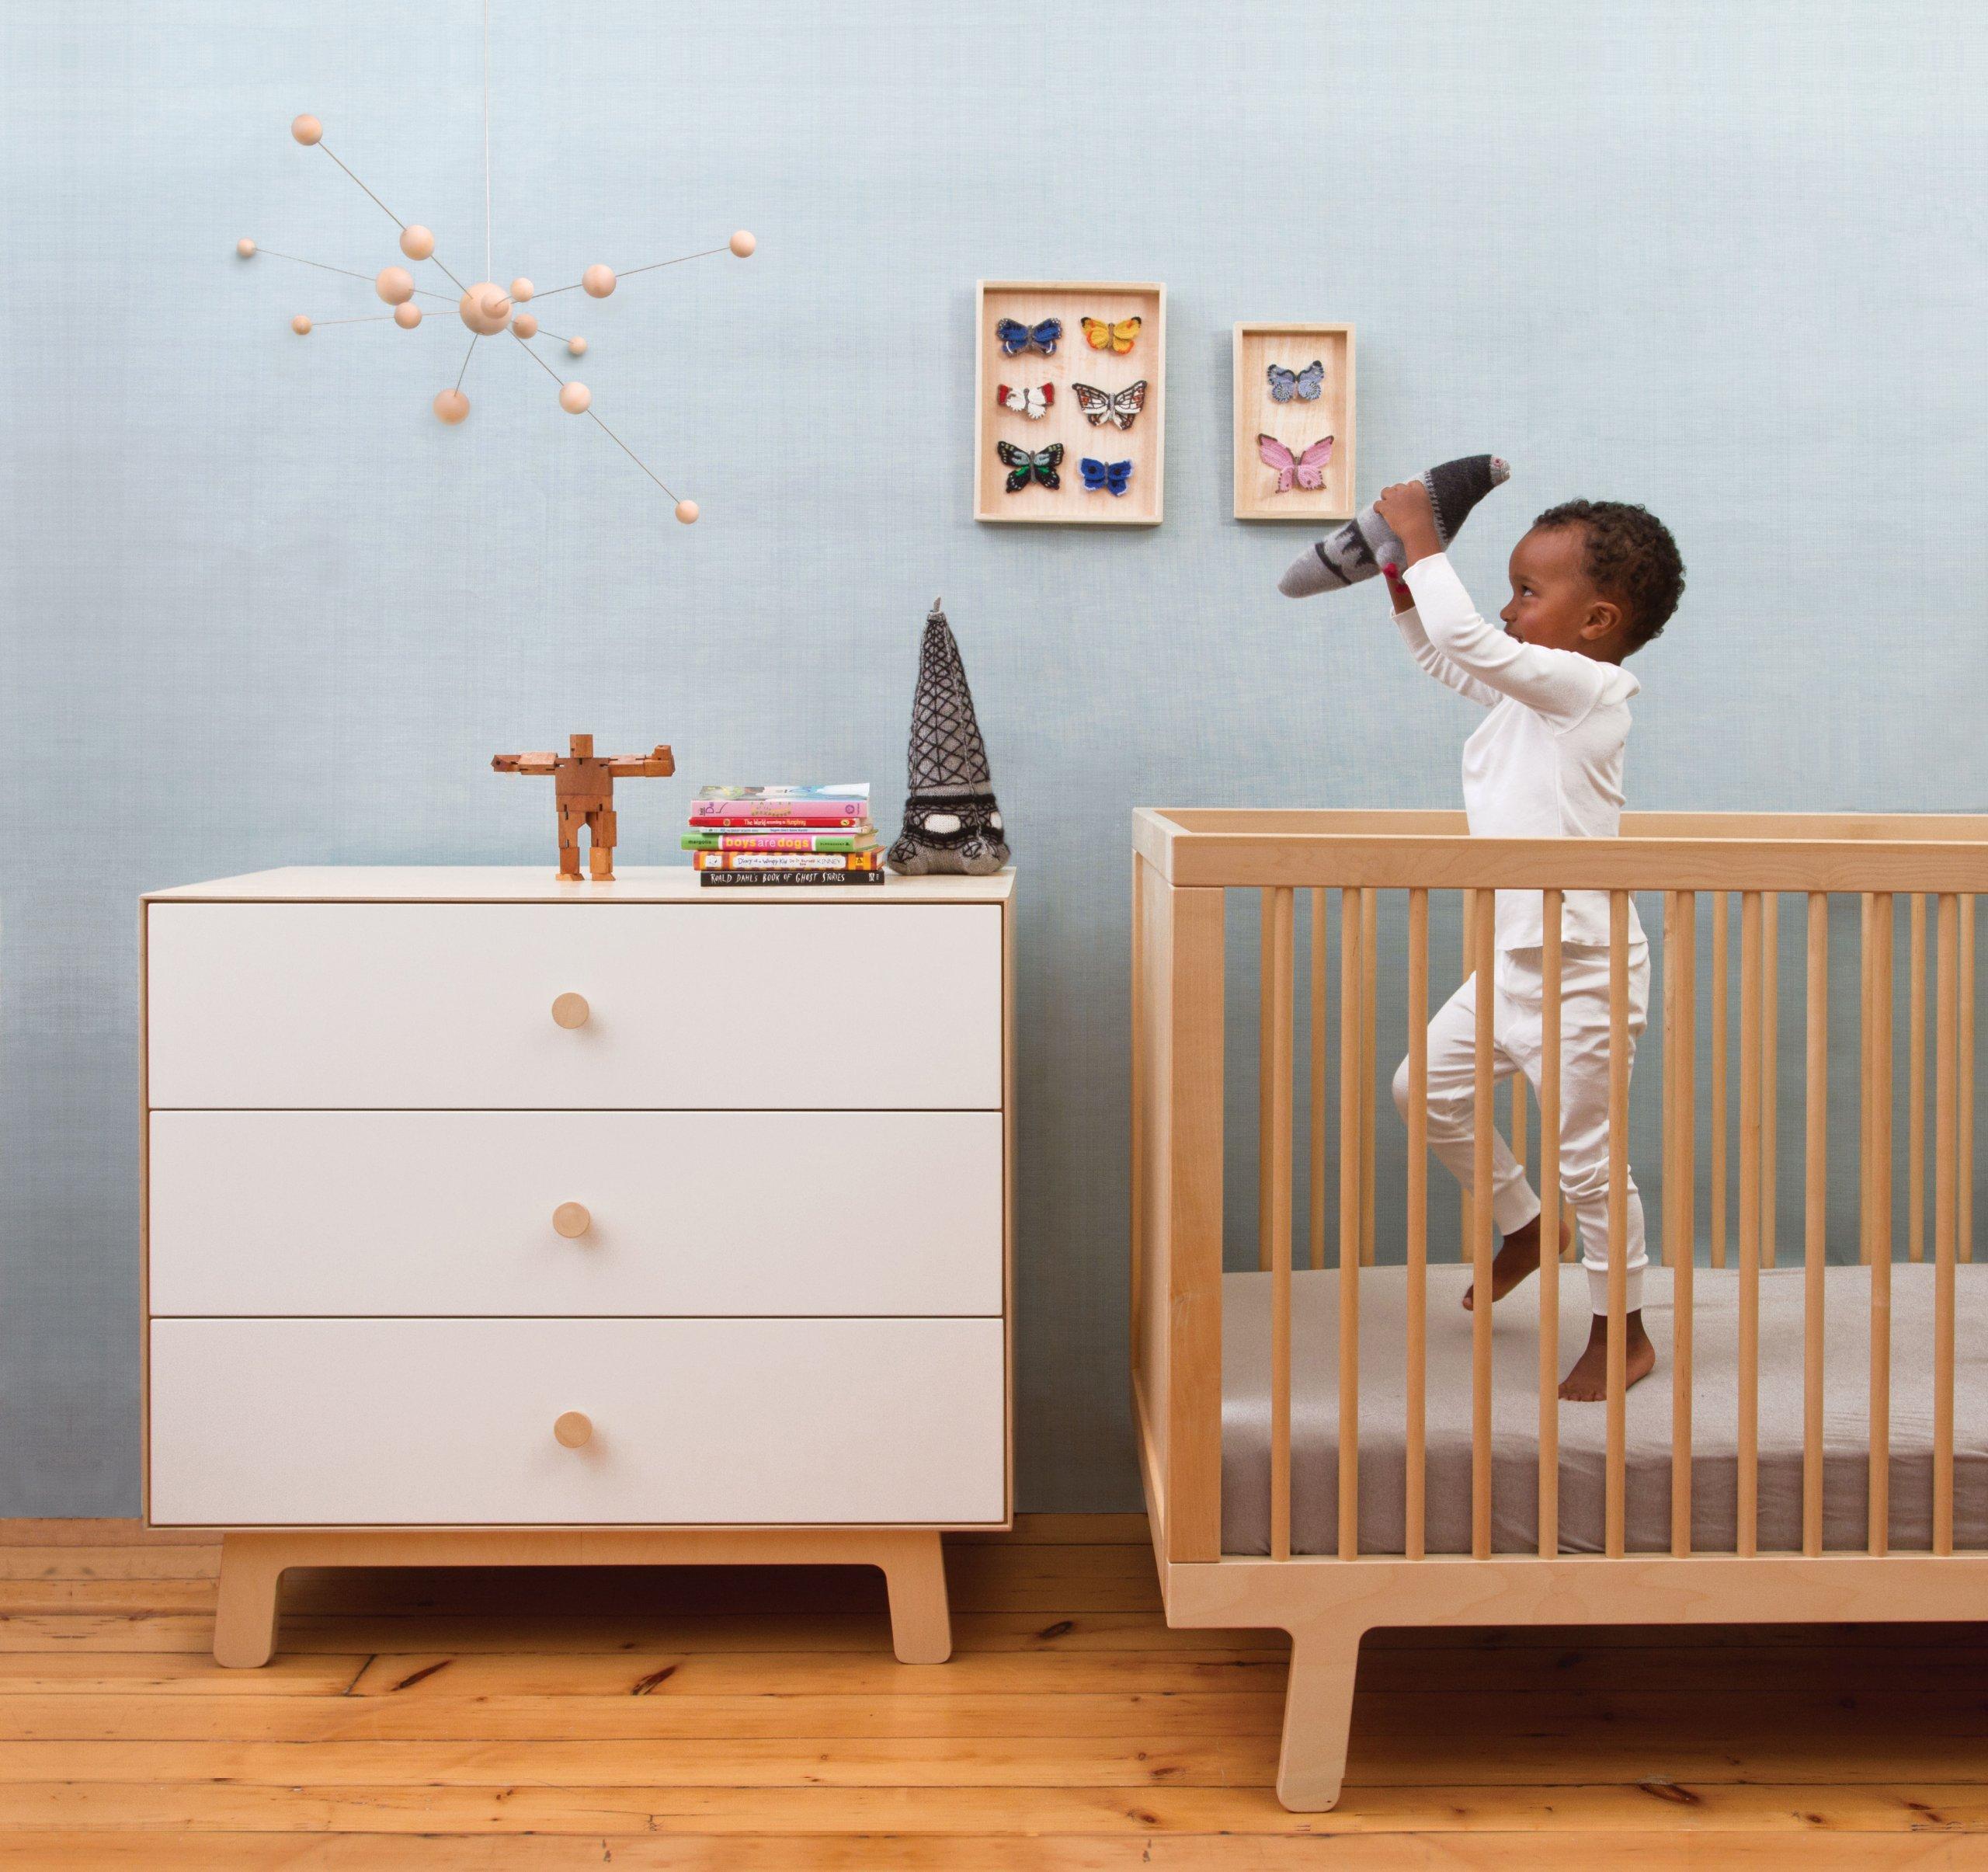 Oeuf Merlin Sparrow Dresser - Birch/White (2 of 2) by Oeuf